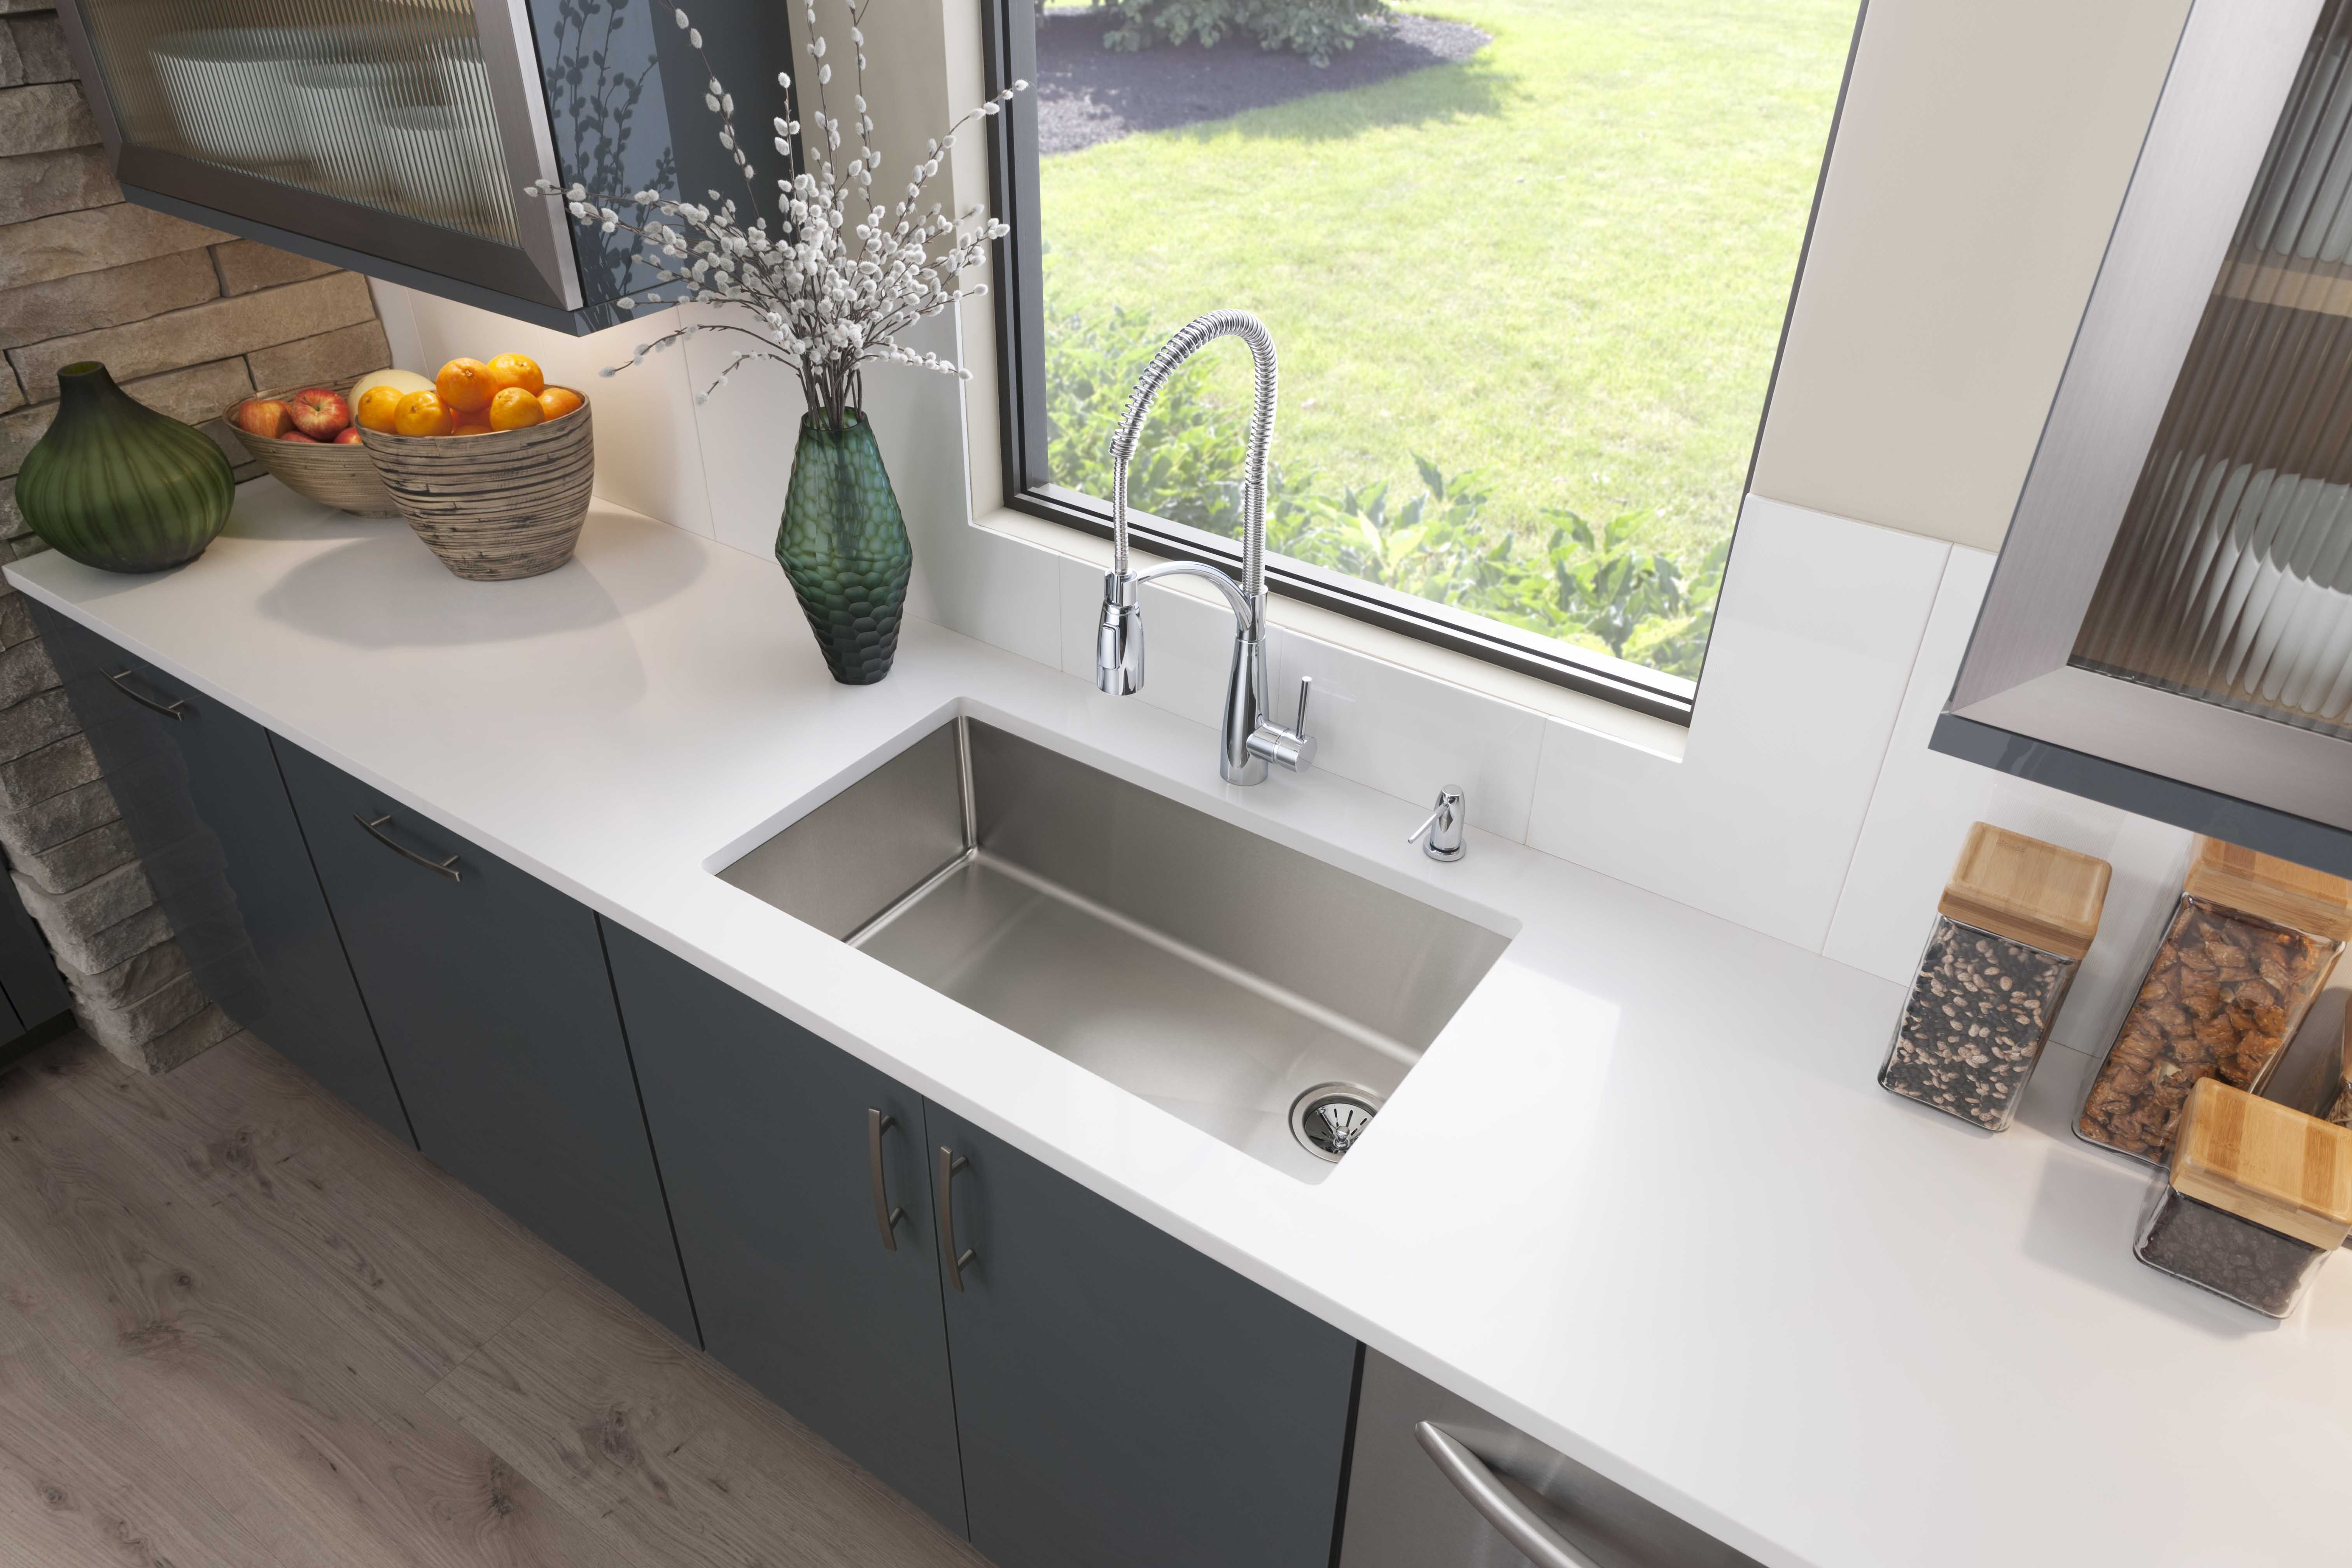 Elkay Crosstown Stainless Steel Sink Single Bowl Kitchen Sink